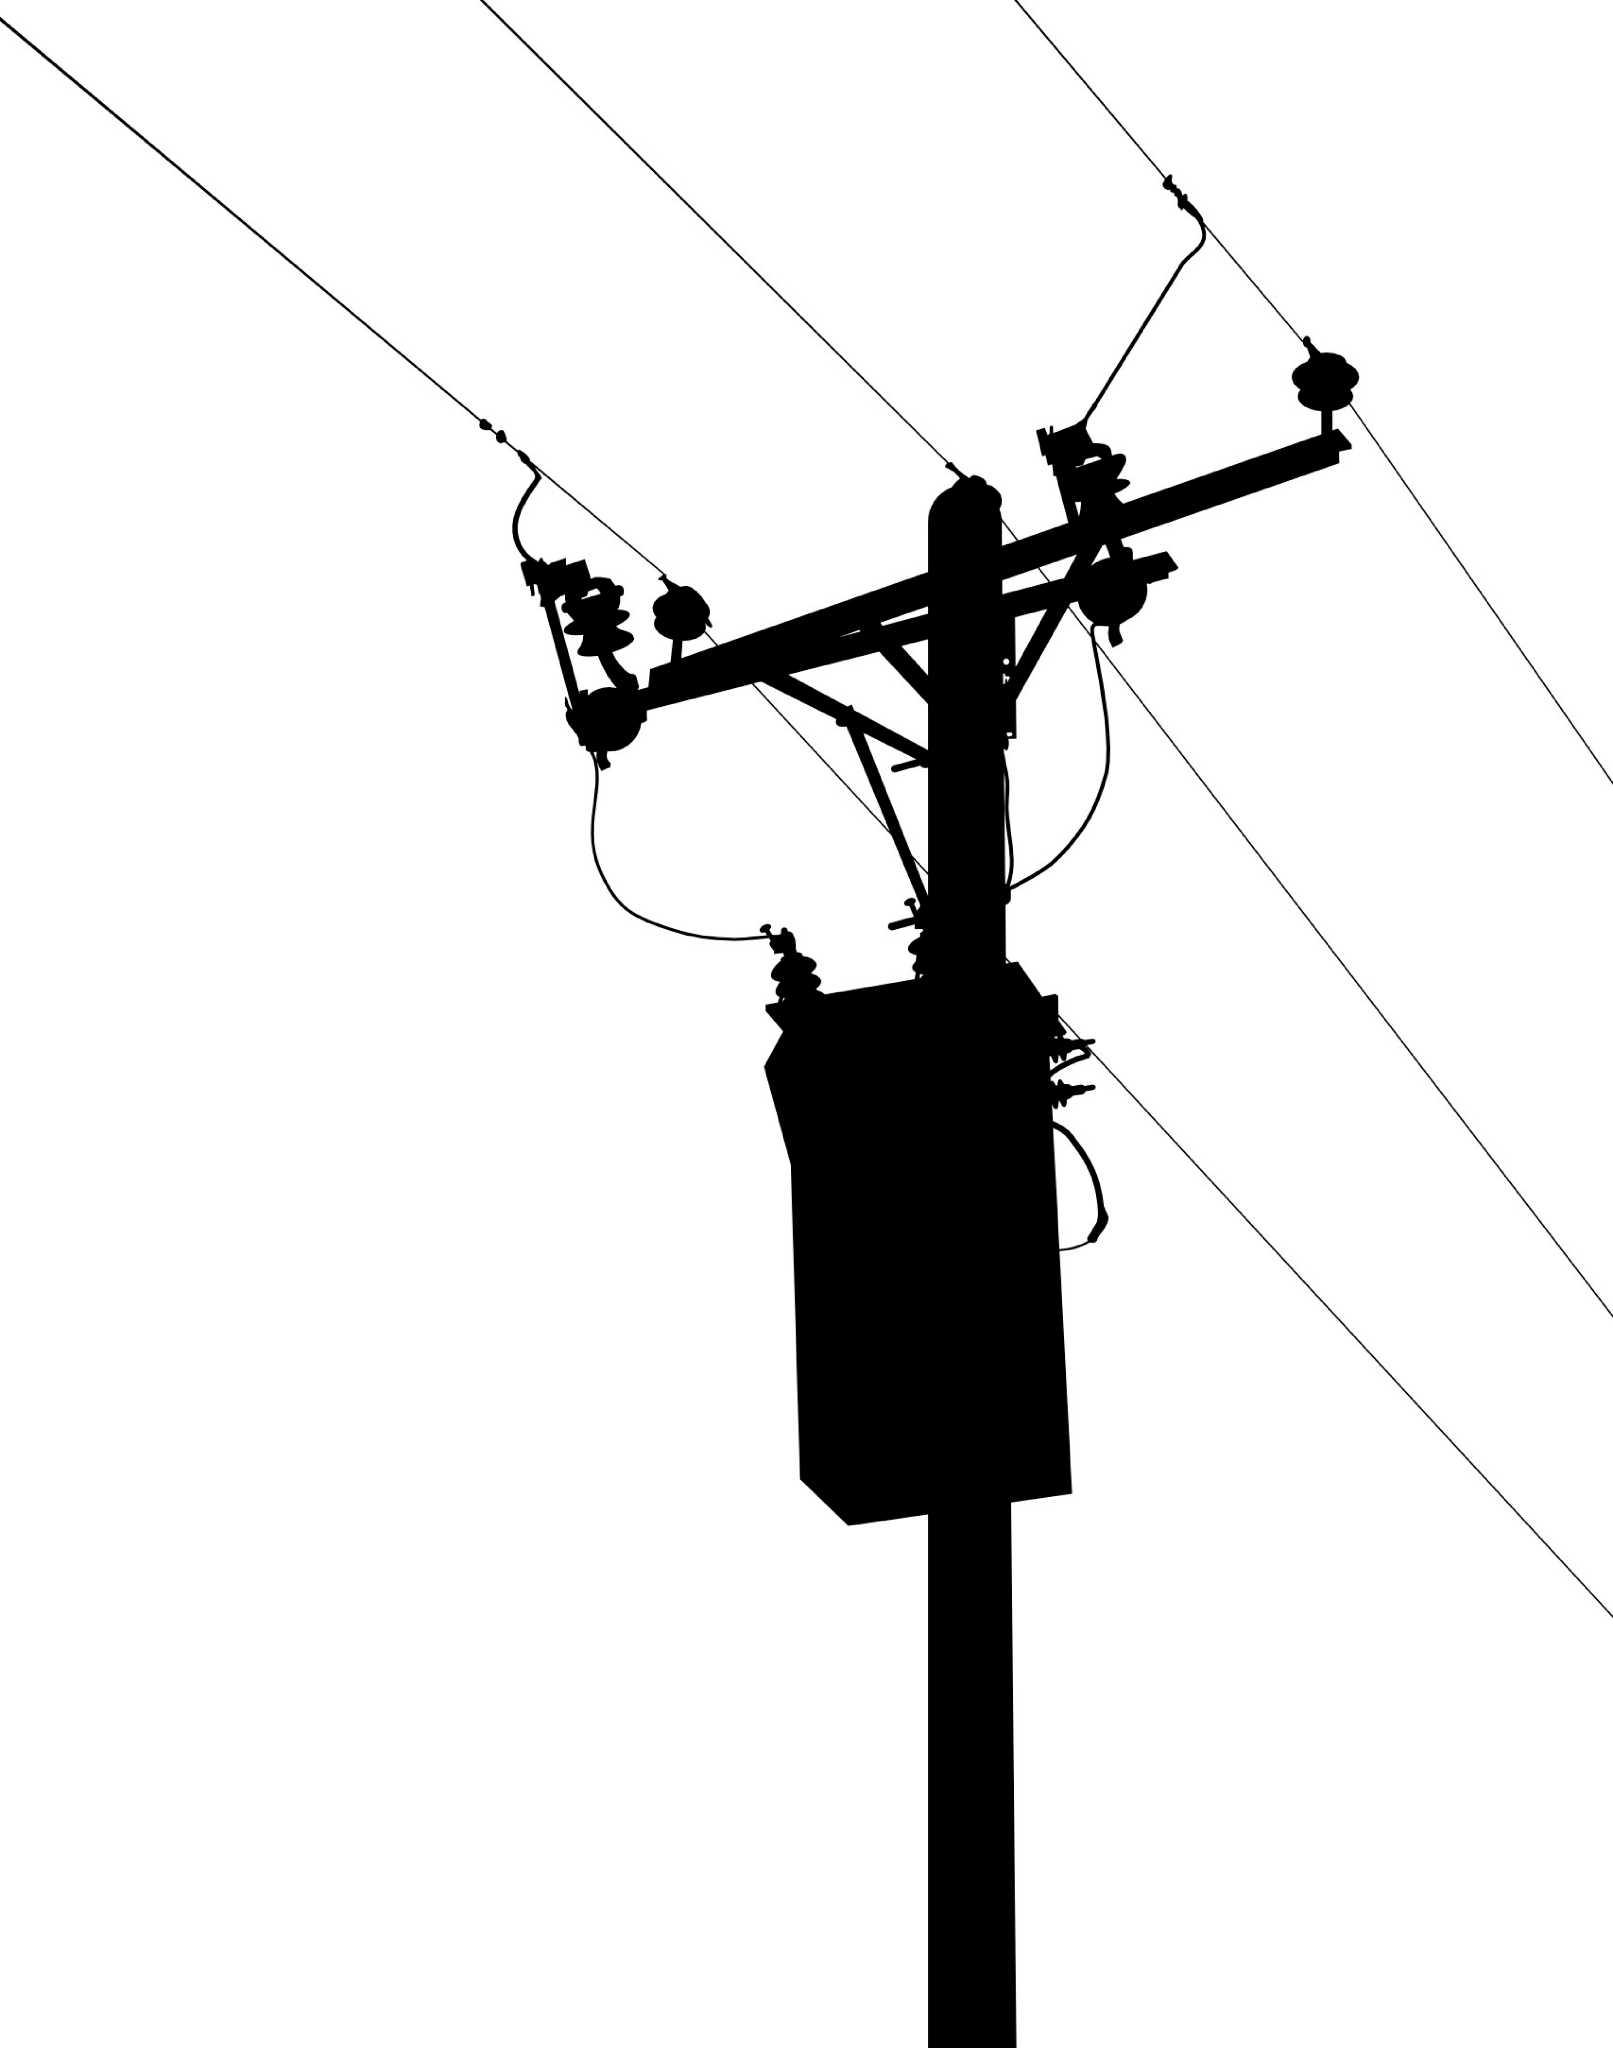 When Summer Arrives Texas Electricity Reserve Margins